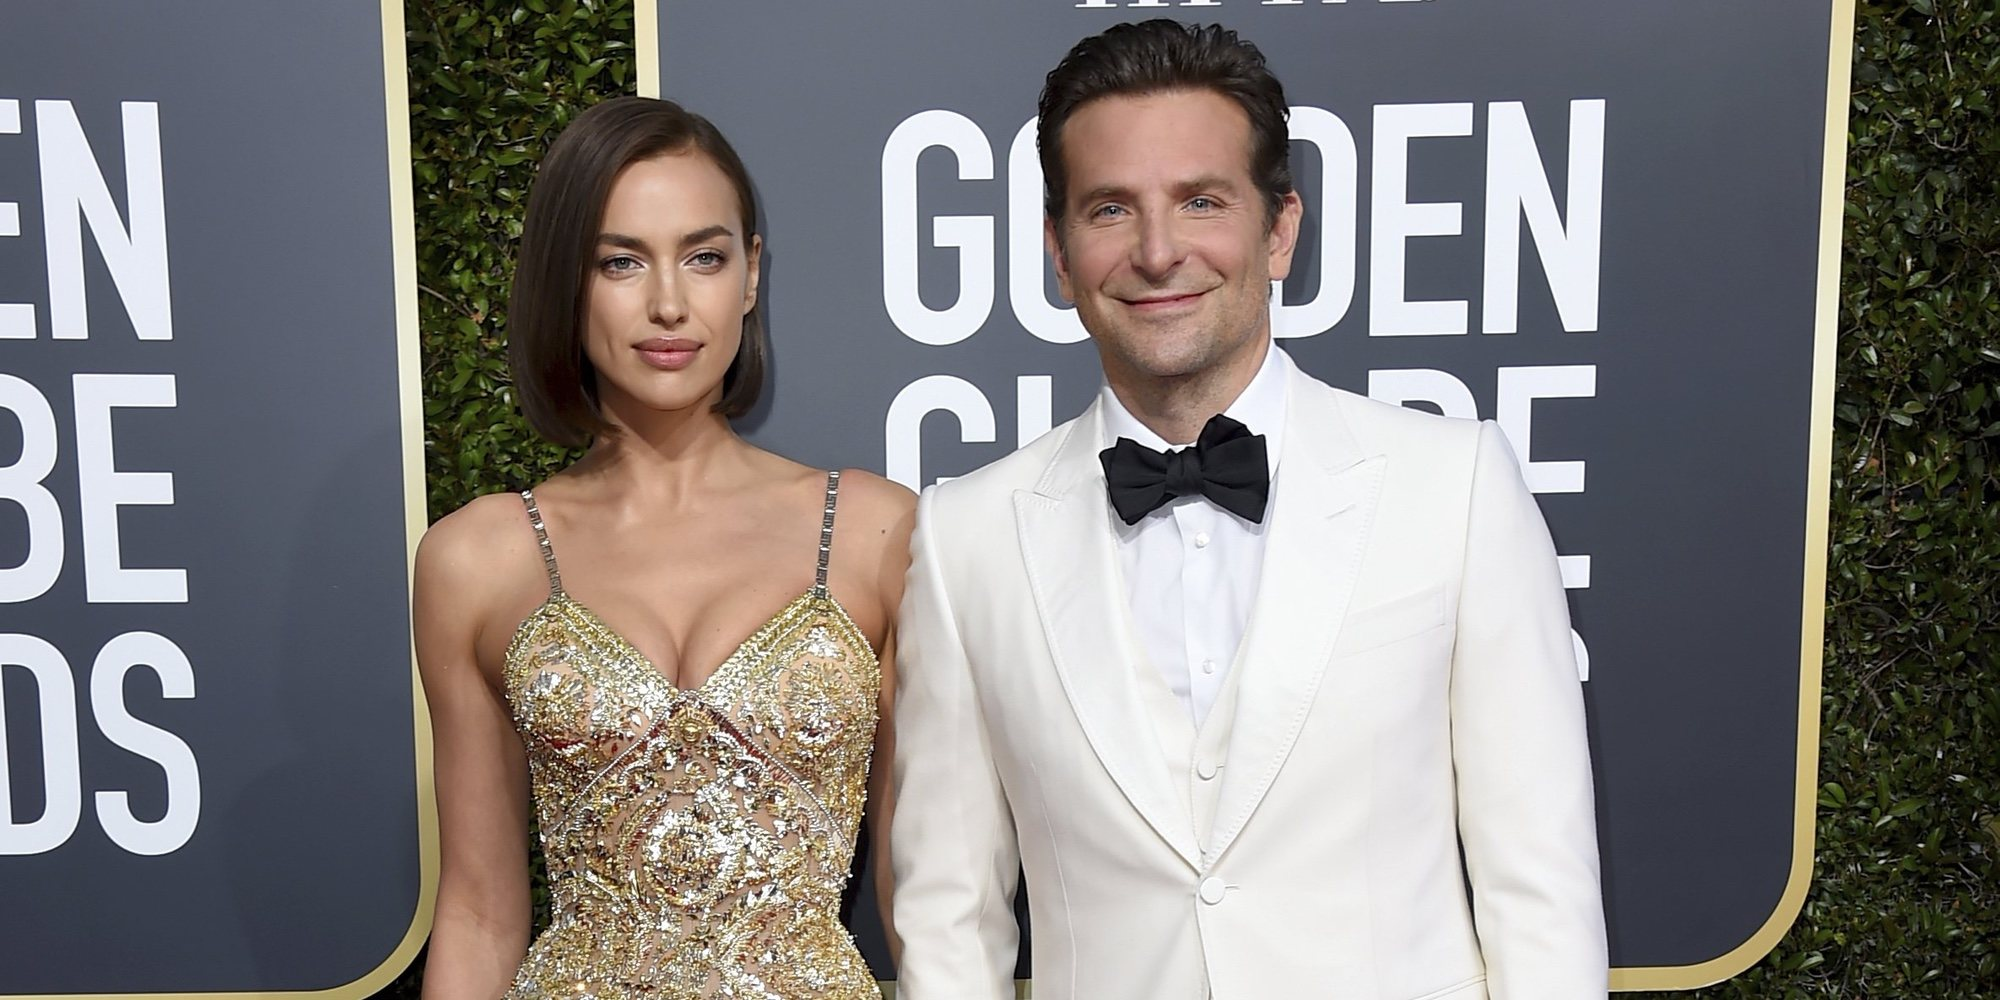 Bradley Cooper e Irina Shayk ya vivían vidas separadas antes de romper su relación